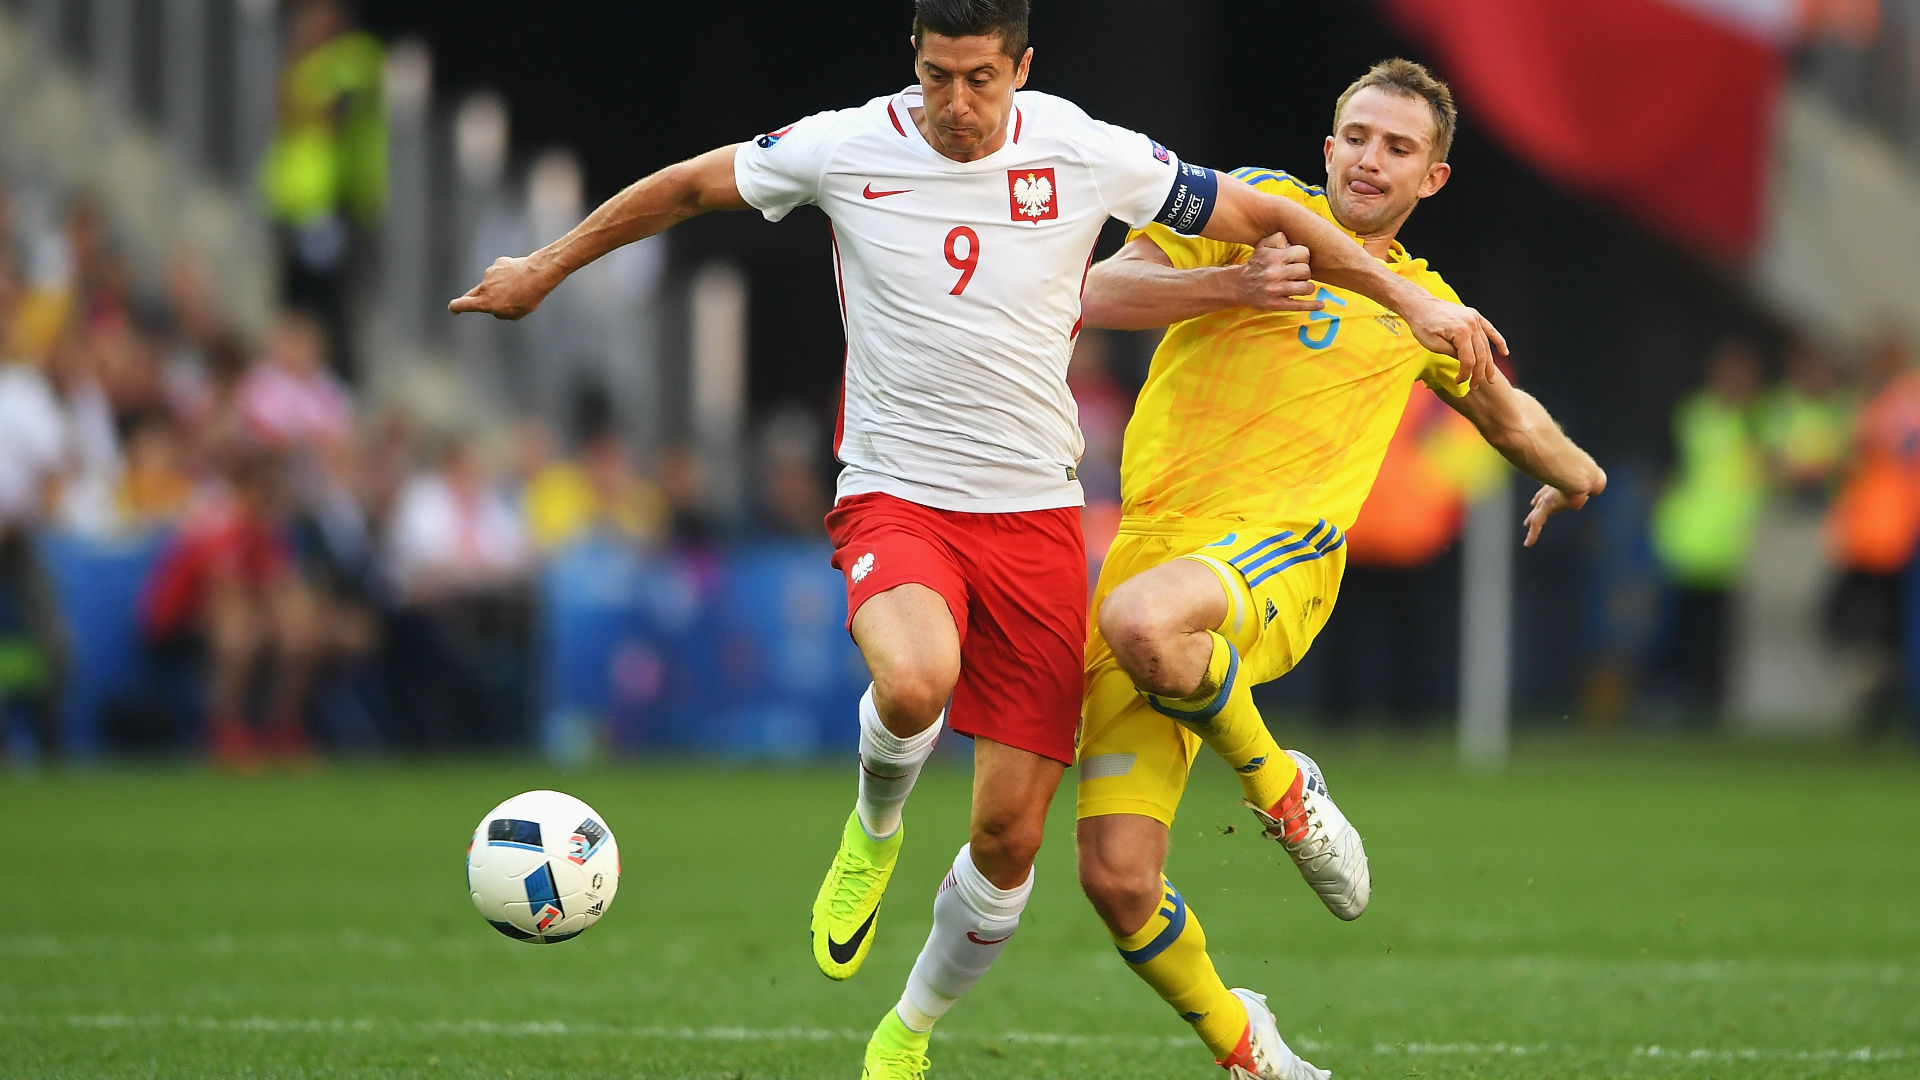 Польша - Роберт Левандовски ЕВРО-2016